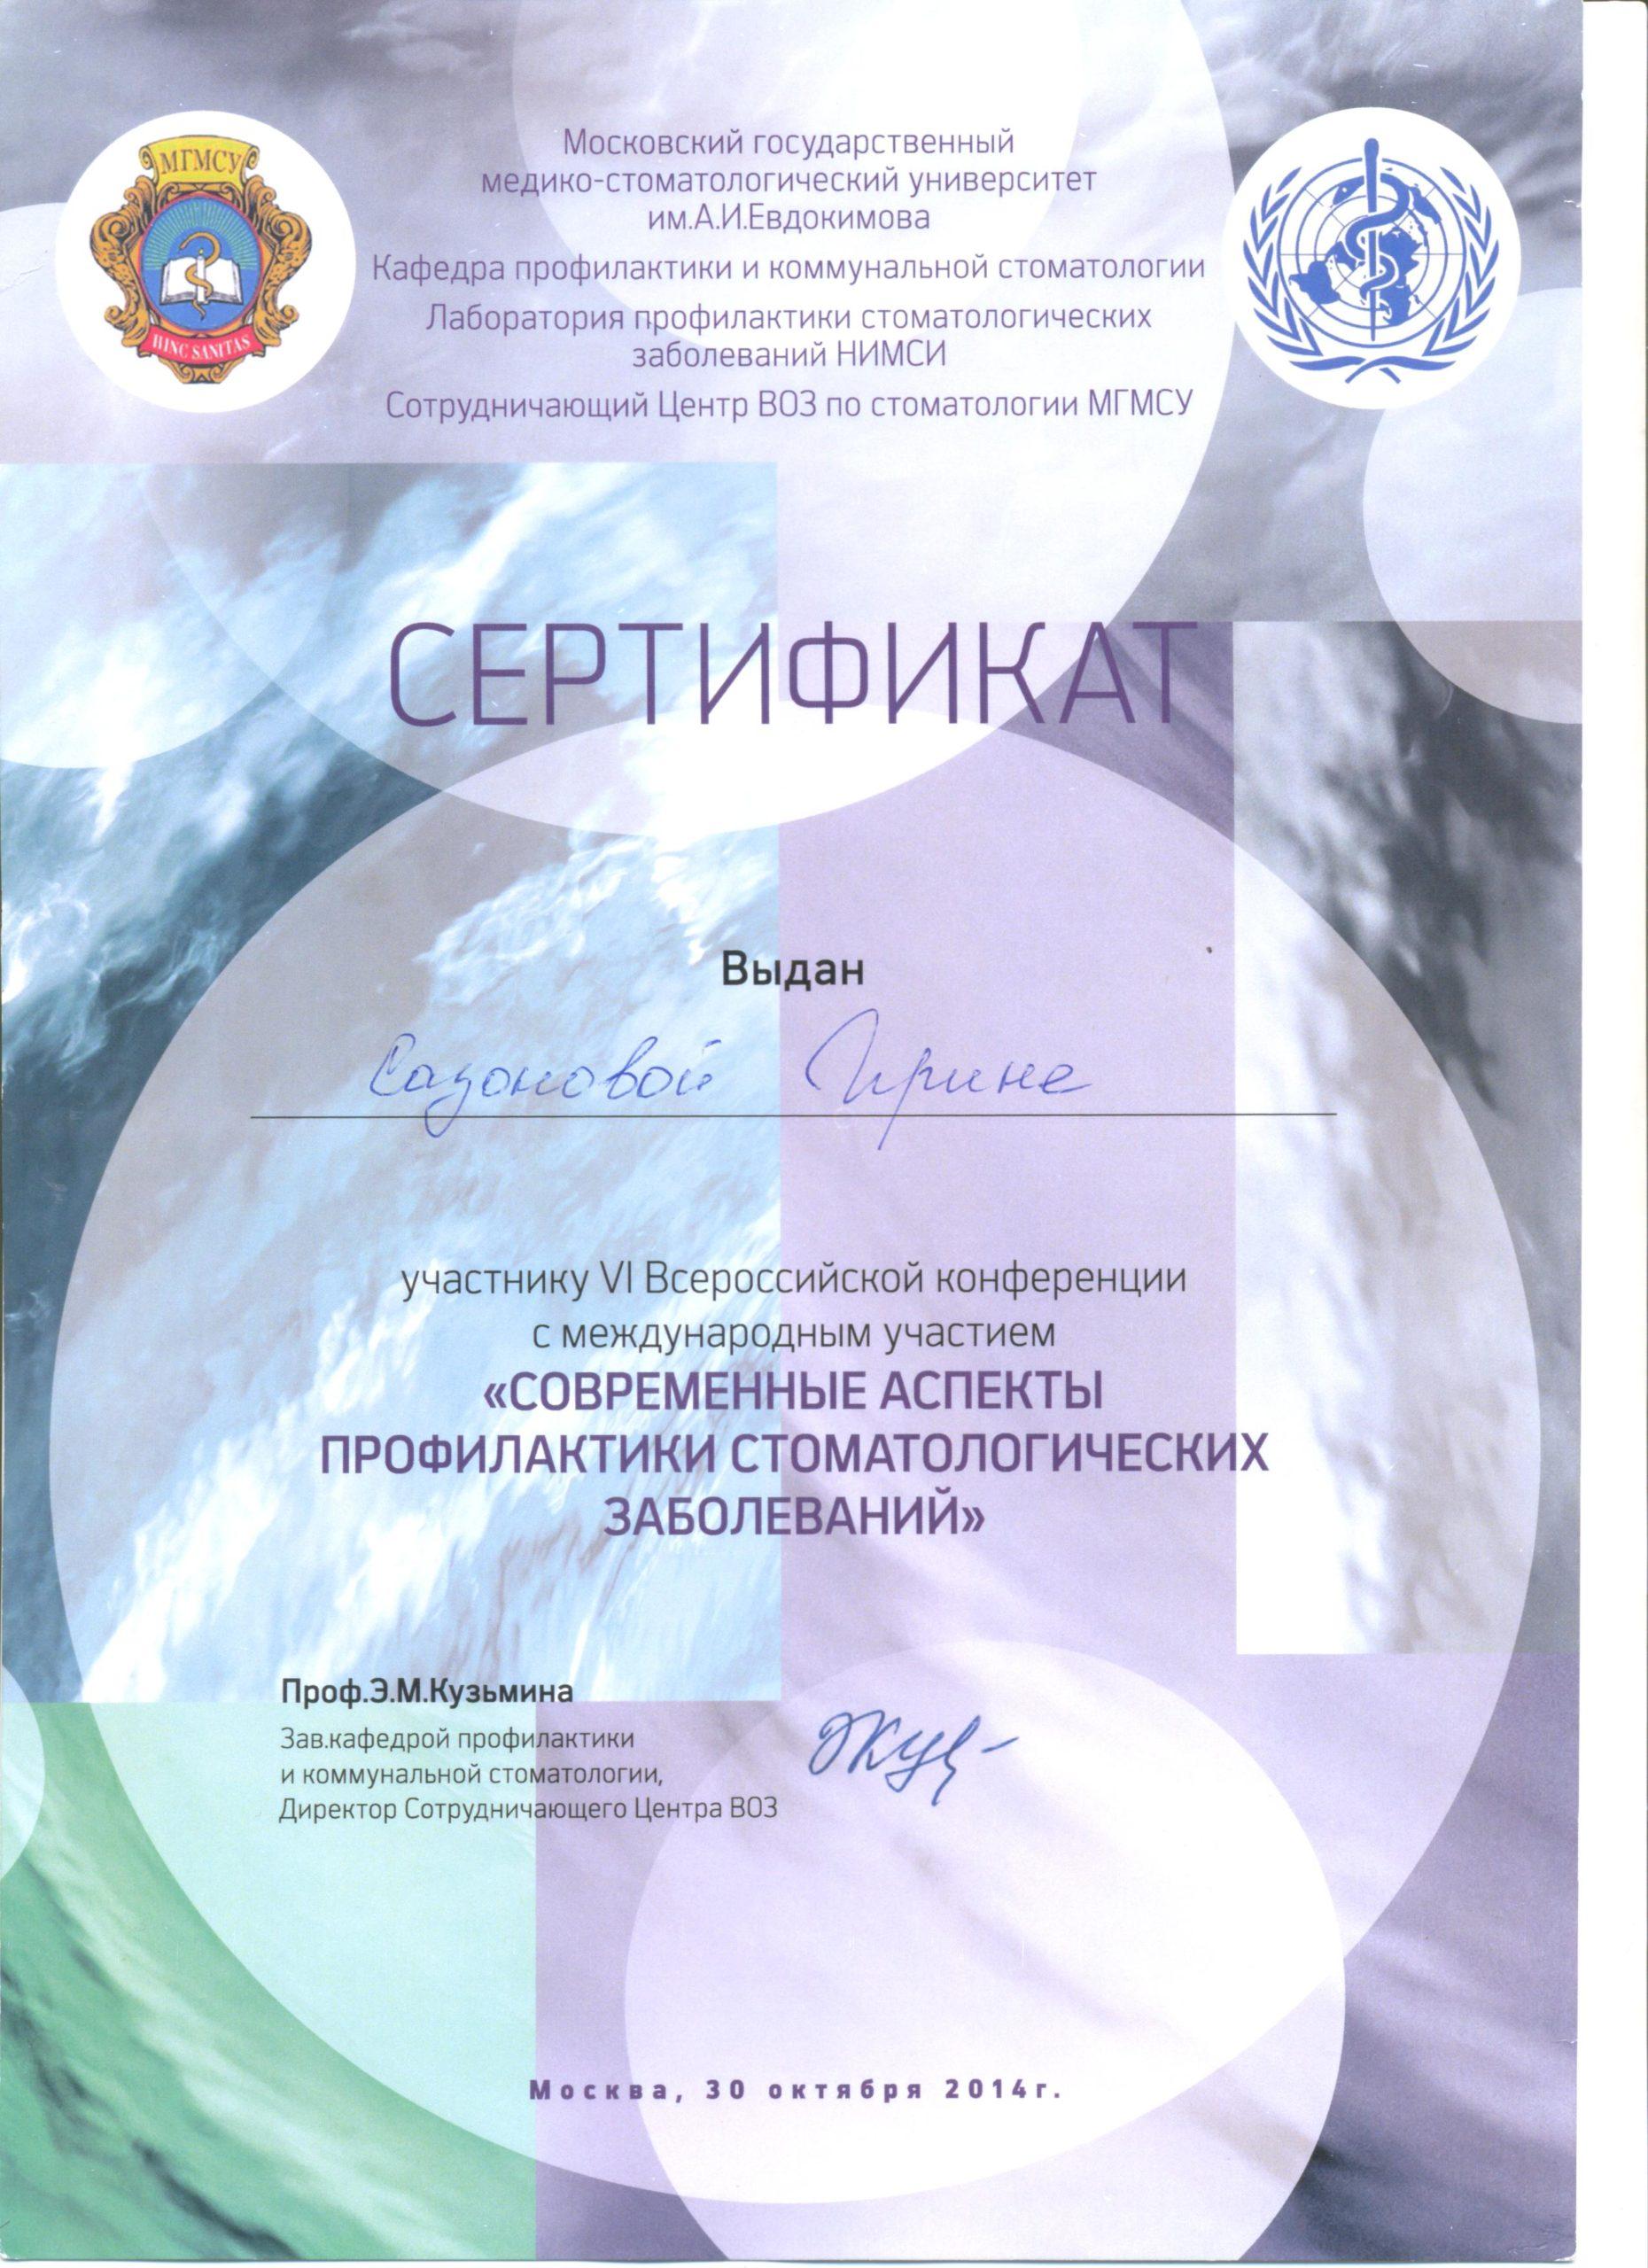 сертификат Сазонова (2014)